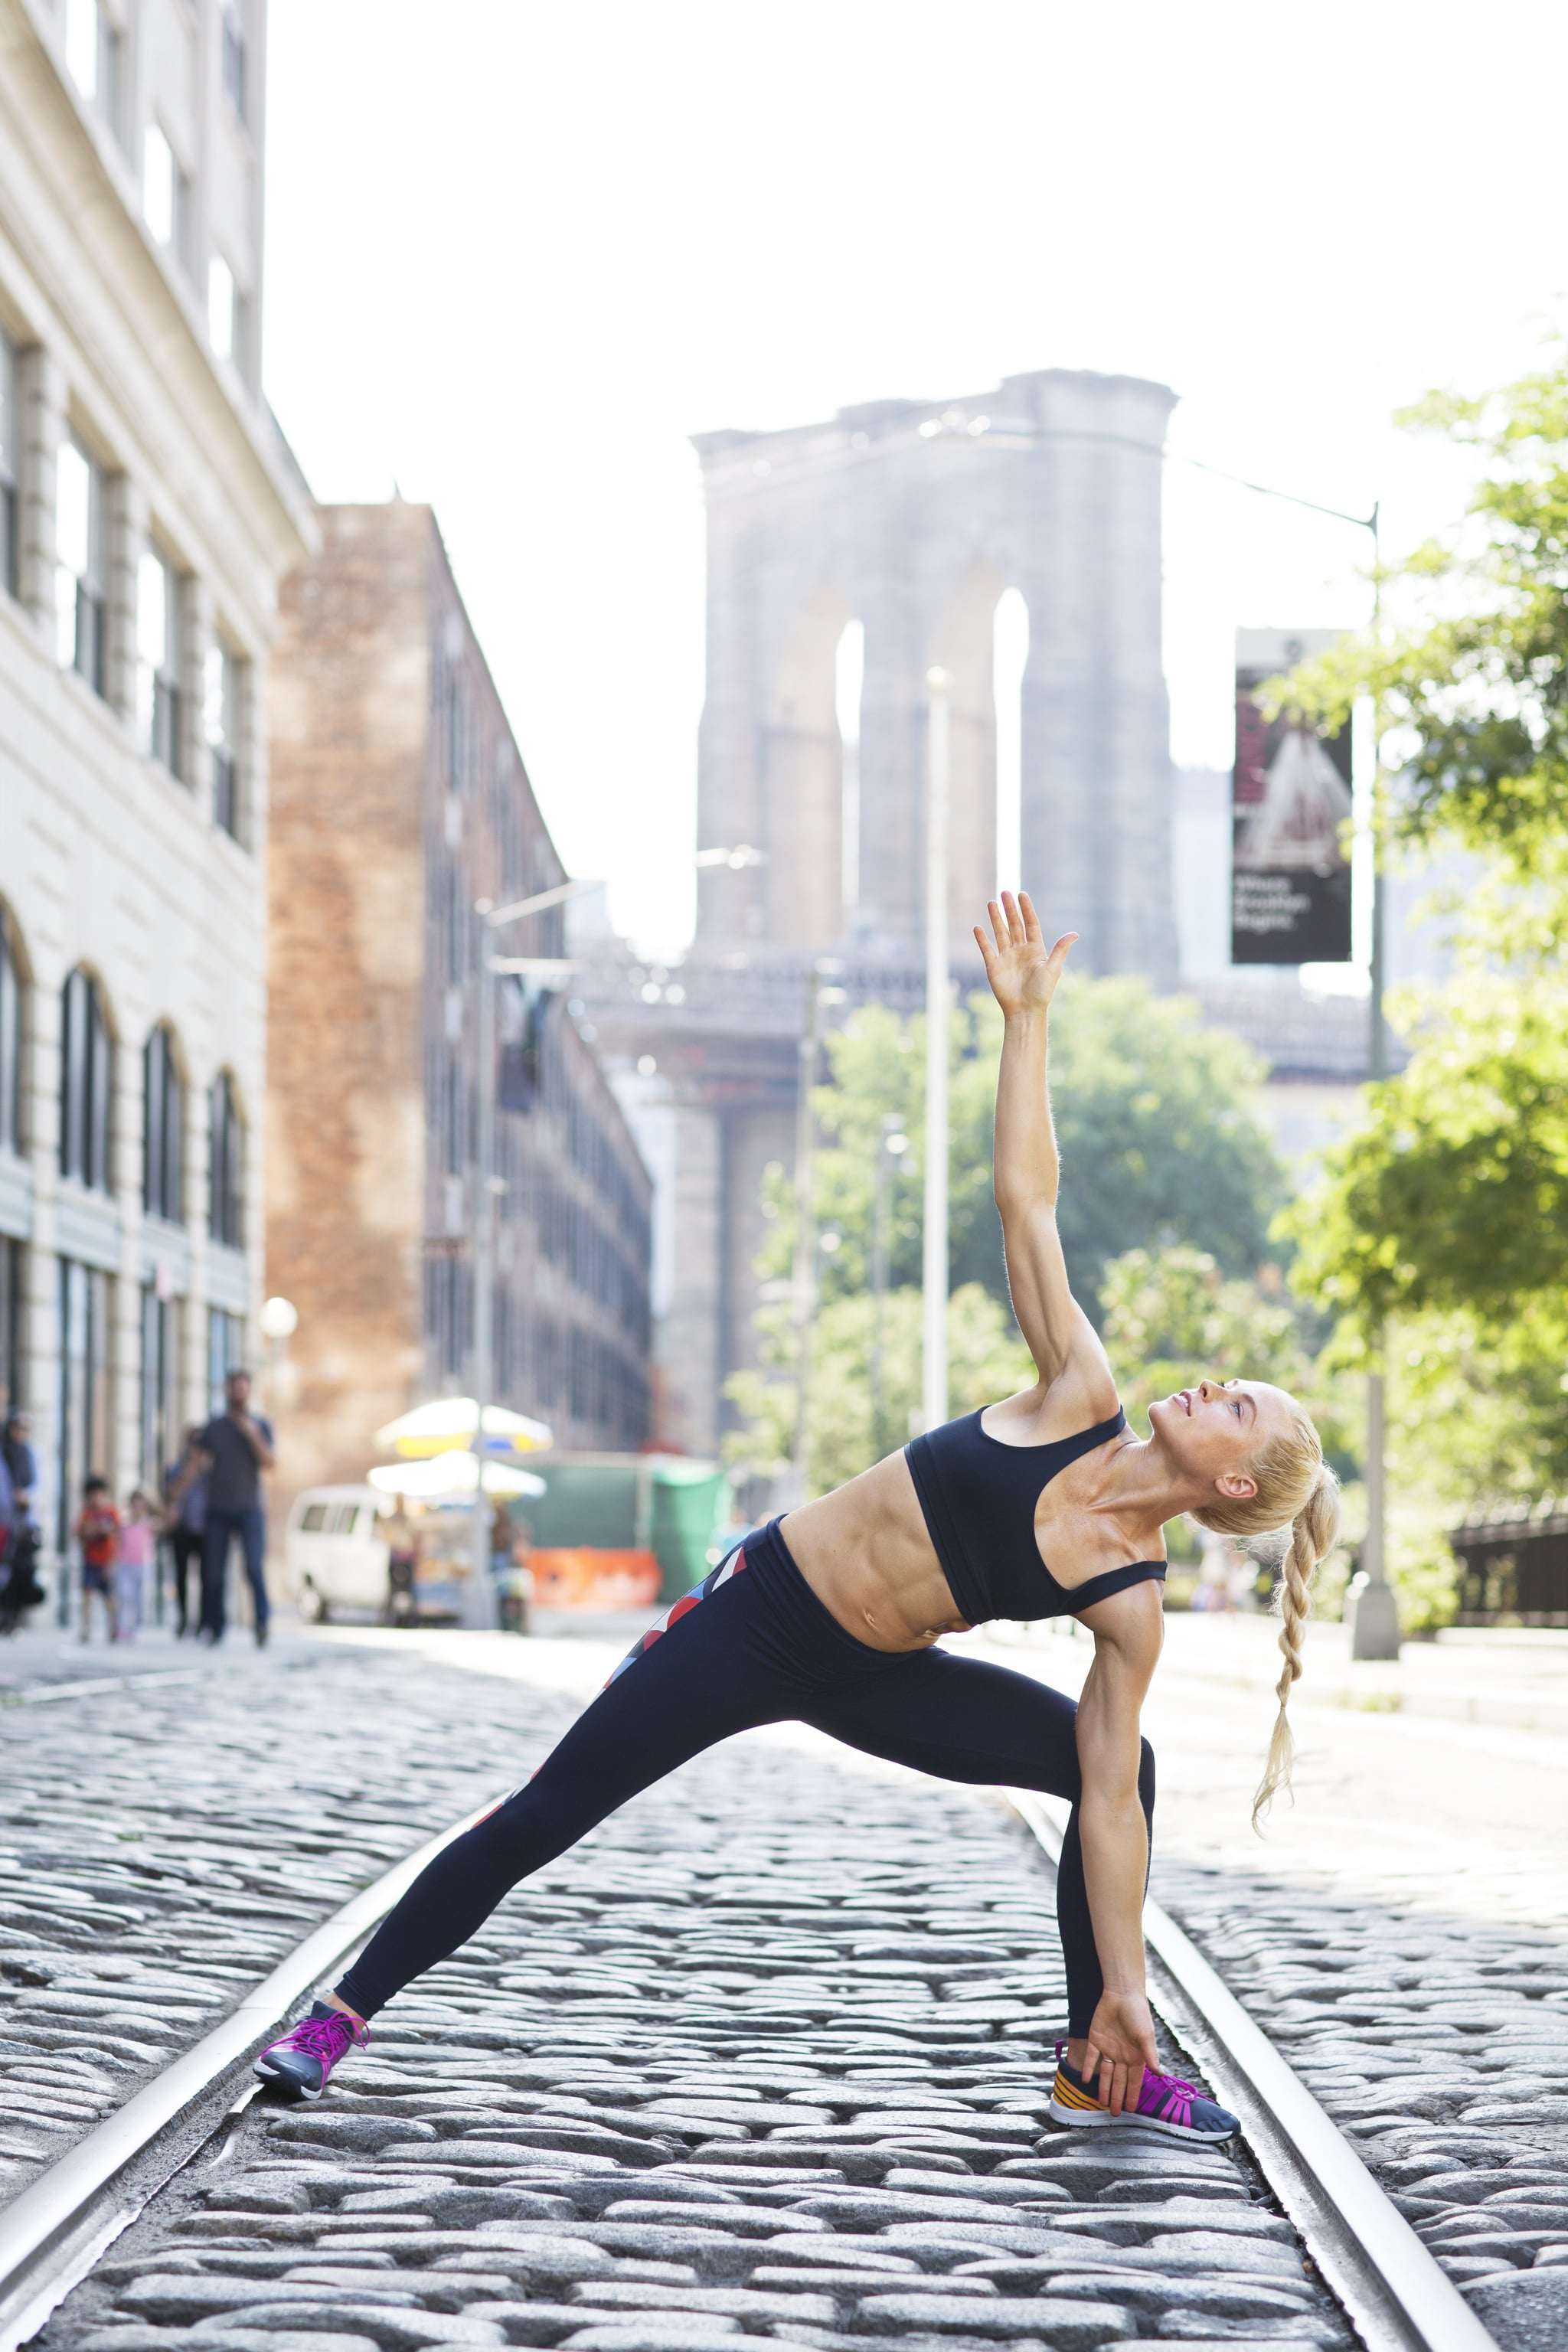 Do I Need to Do Yoga? | POPSUGAR Fitness UK